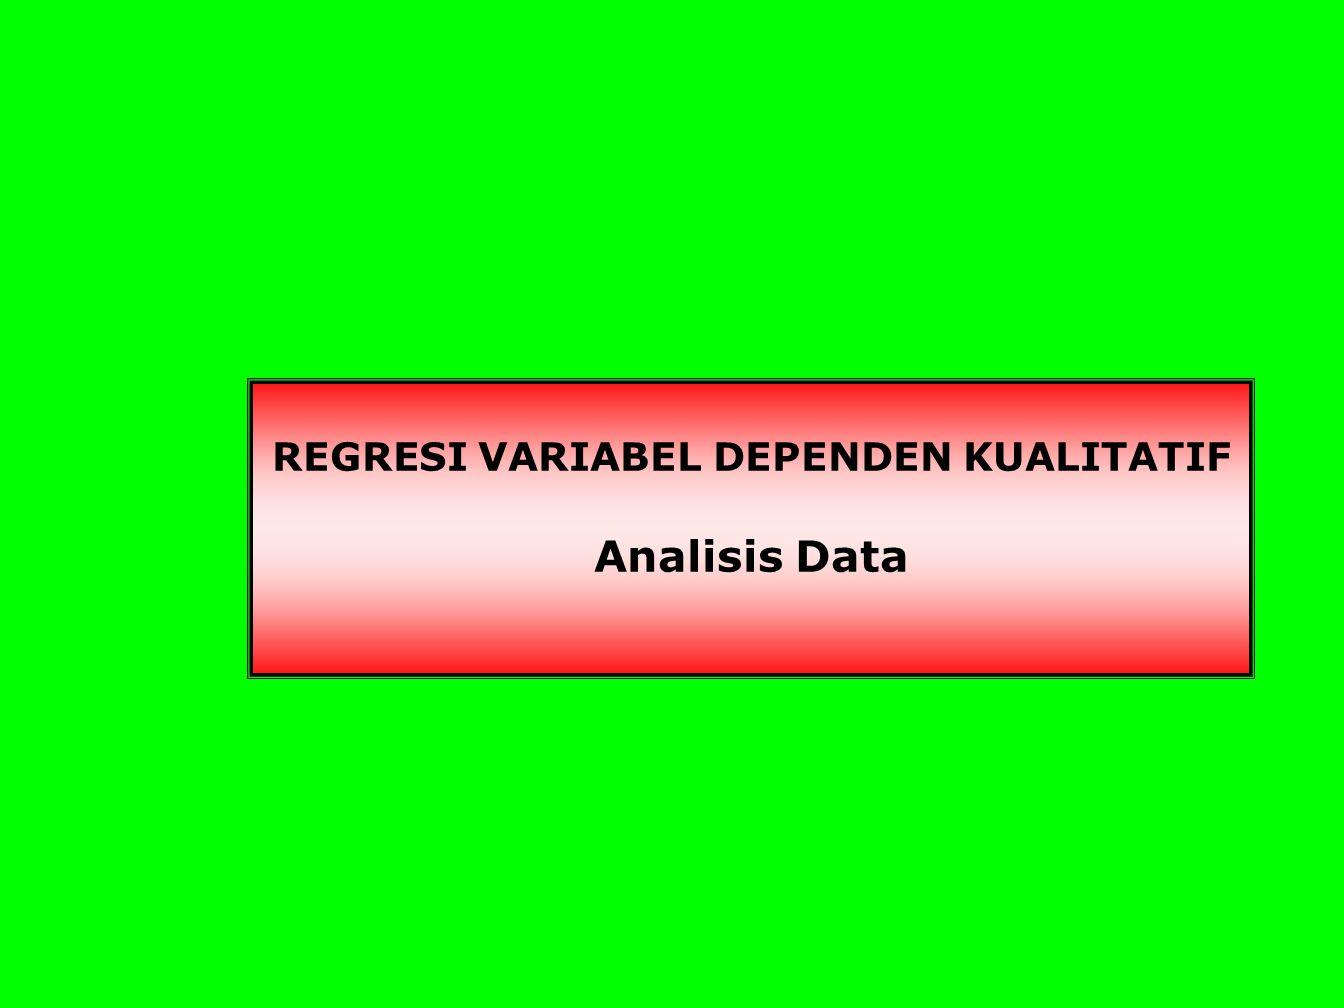 REGRESI VARIABEL DEPENDEN KUALITATIF